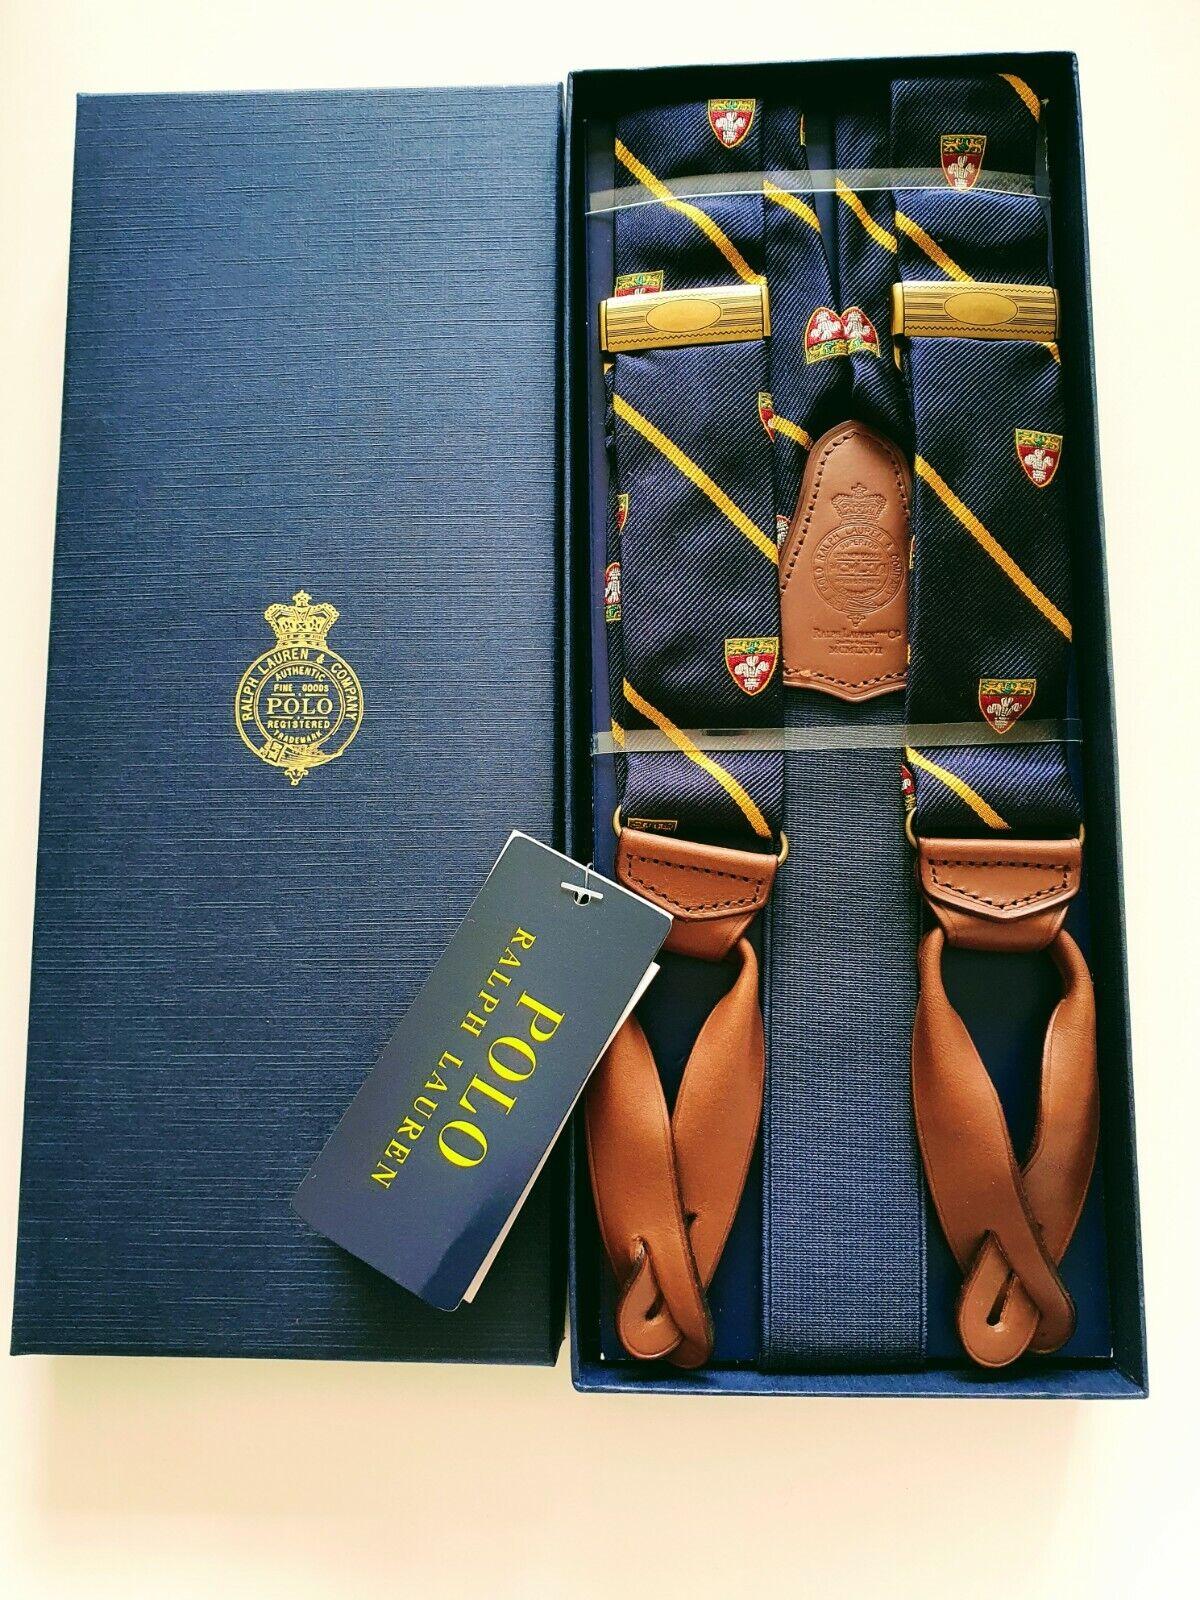 Ralph Lauren Polo Suspenders Braces Mens Striped Navy Gold Brown Leather BNIB